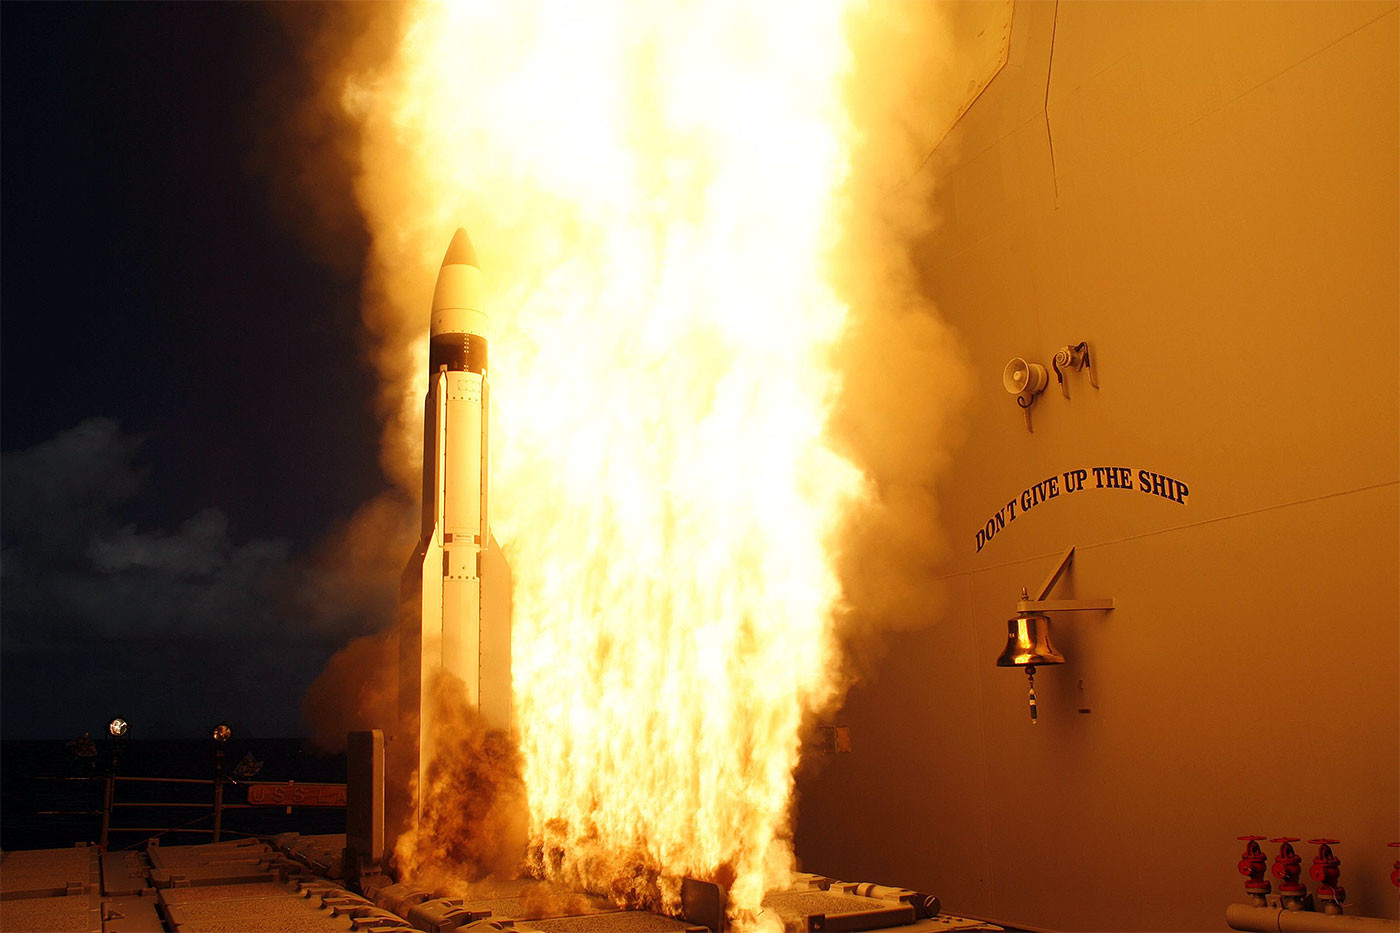 "<p>Фото: &copy; <a href=""https://ru.wikipedia.org/wiki/SM-3#/media/File:USS_Lake_Erie_(CG-70)_SM-3_start.jpg"" target=""_blank"">Wikimedia Commons</a></p>"